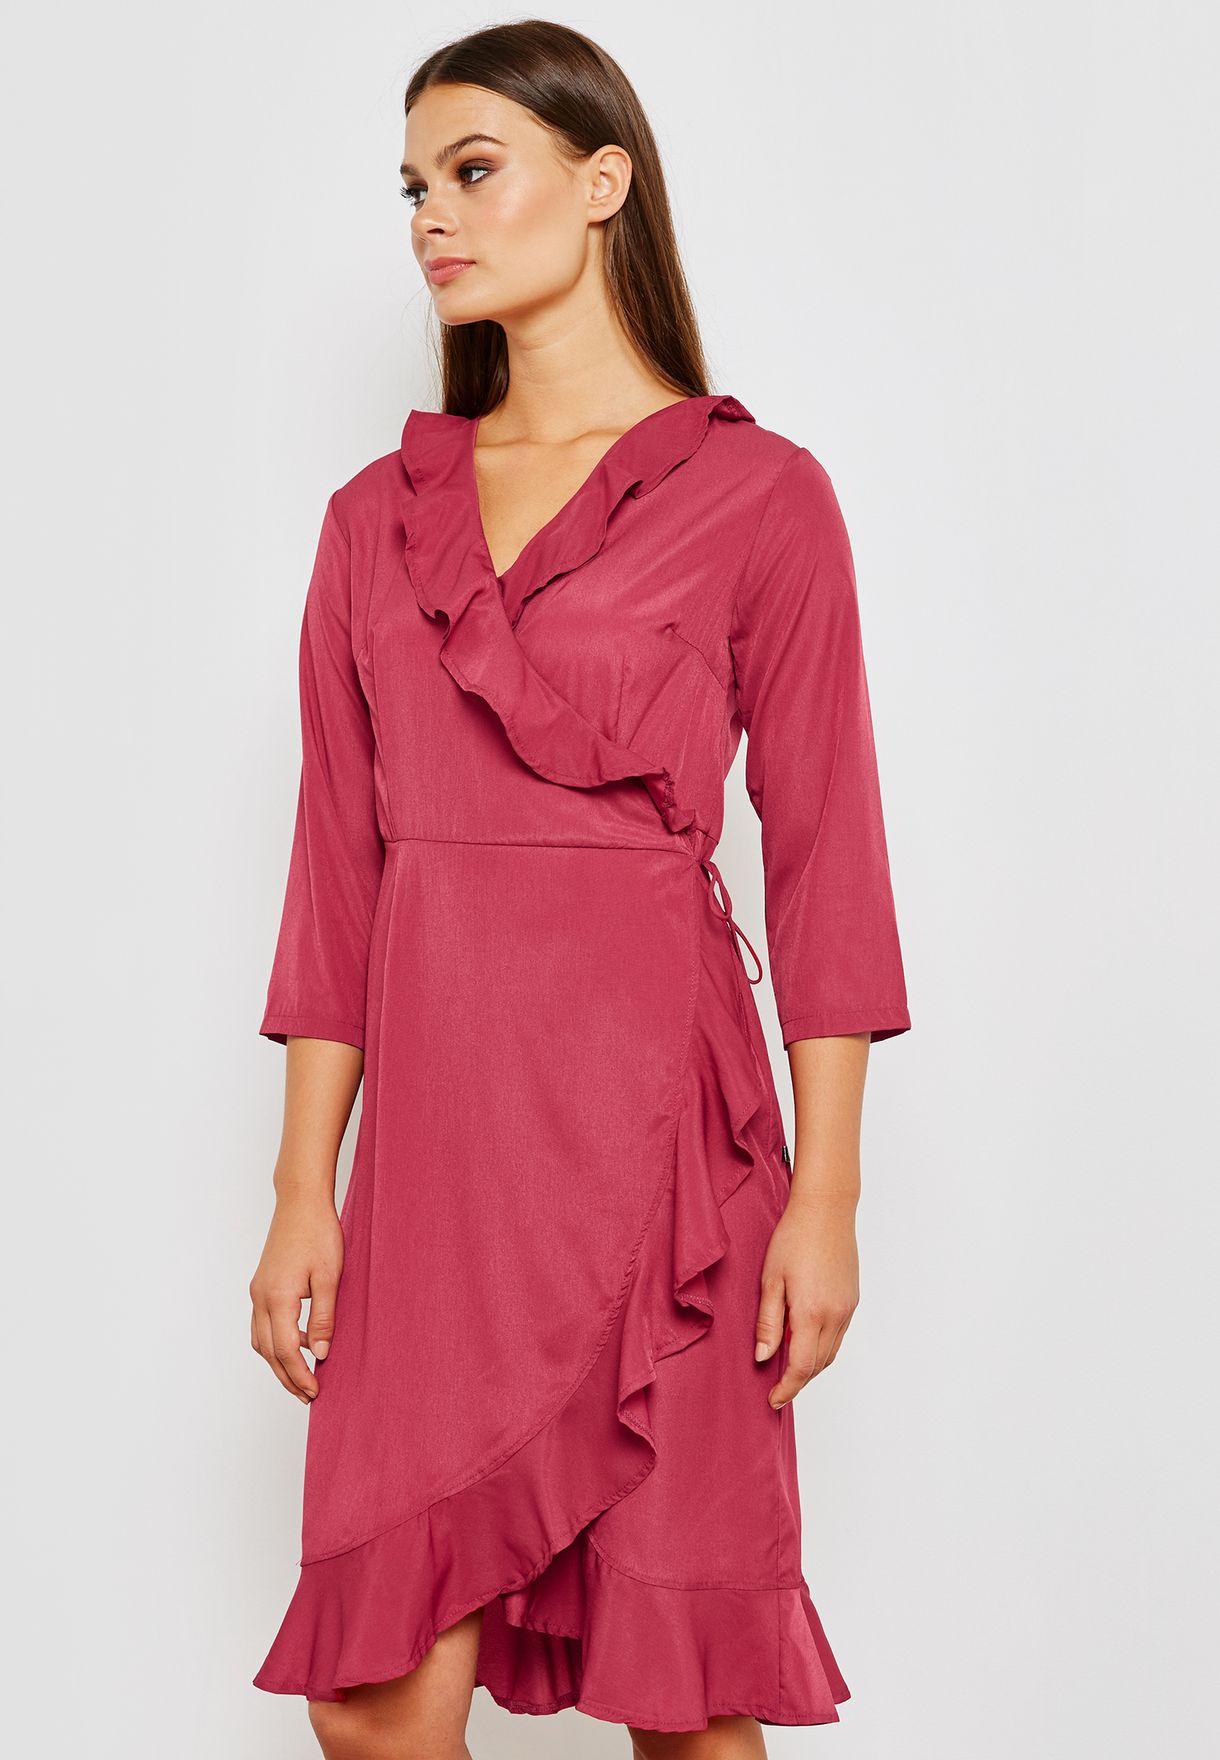 Wrap Front Ruffle Trim Midi Dress